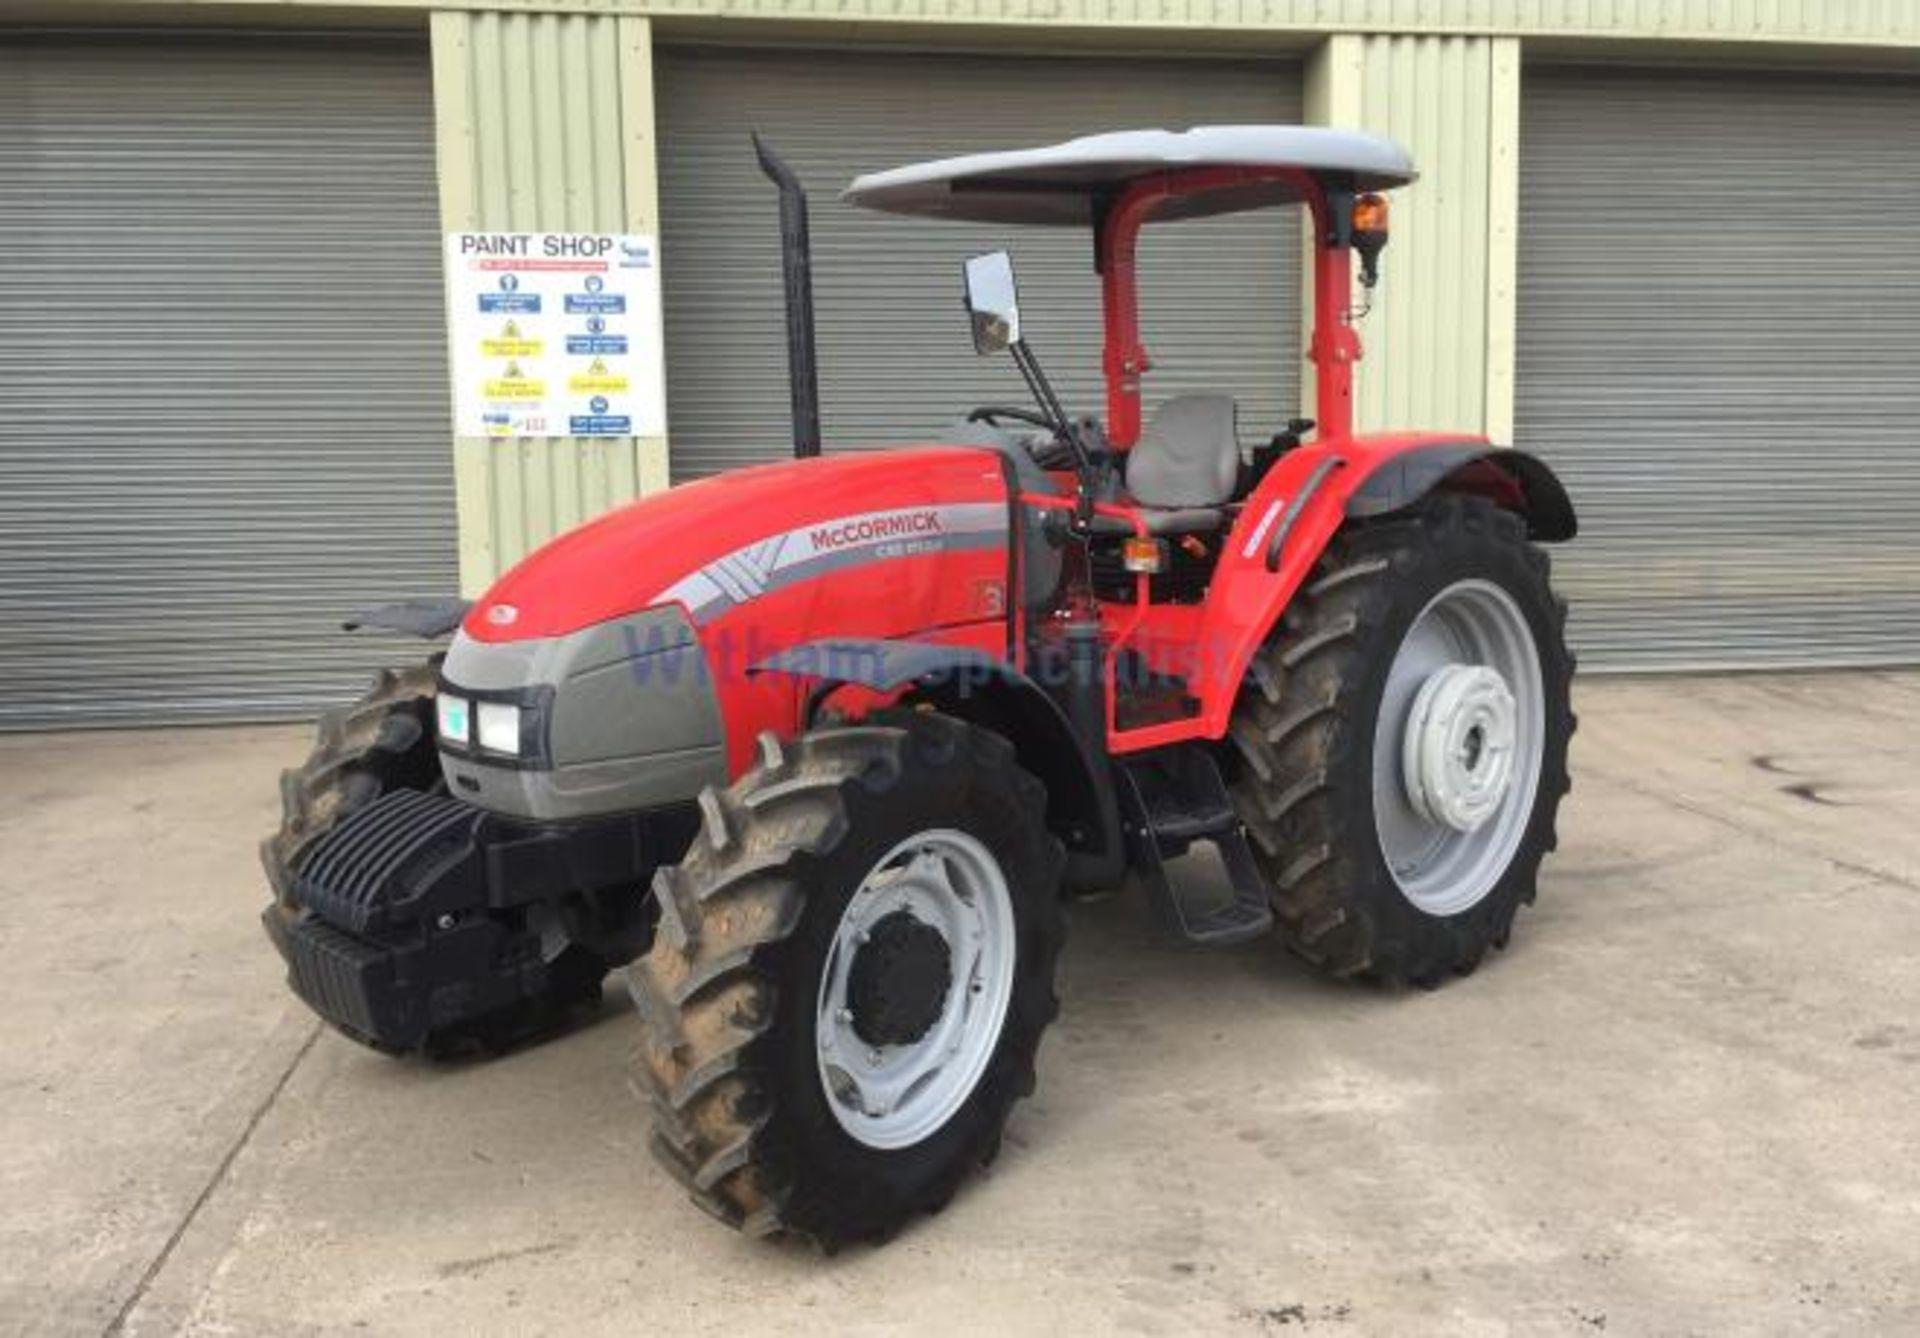 Lot 33 - NEW UNUSED McCormick C90 Max T3 Tractor